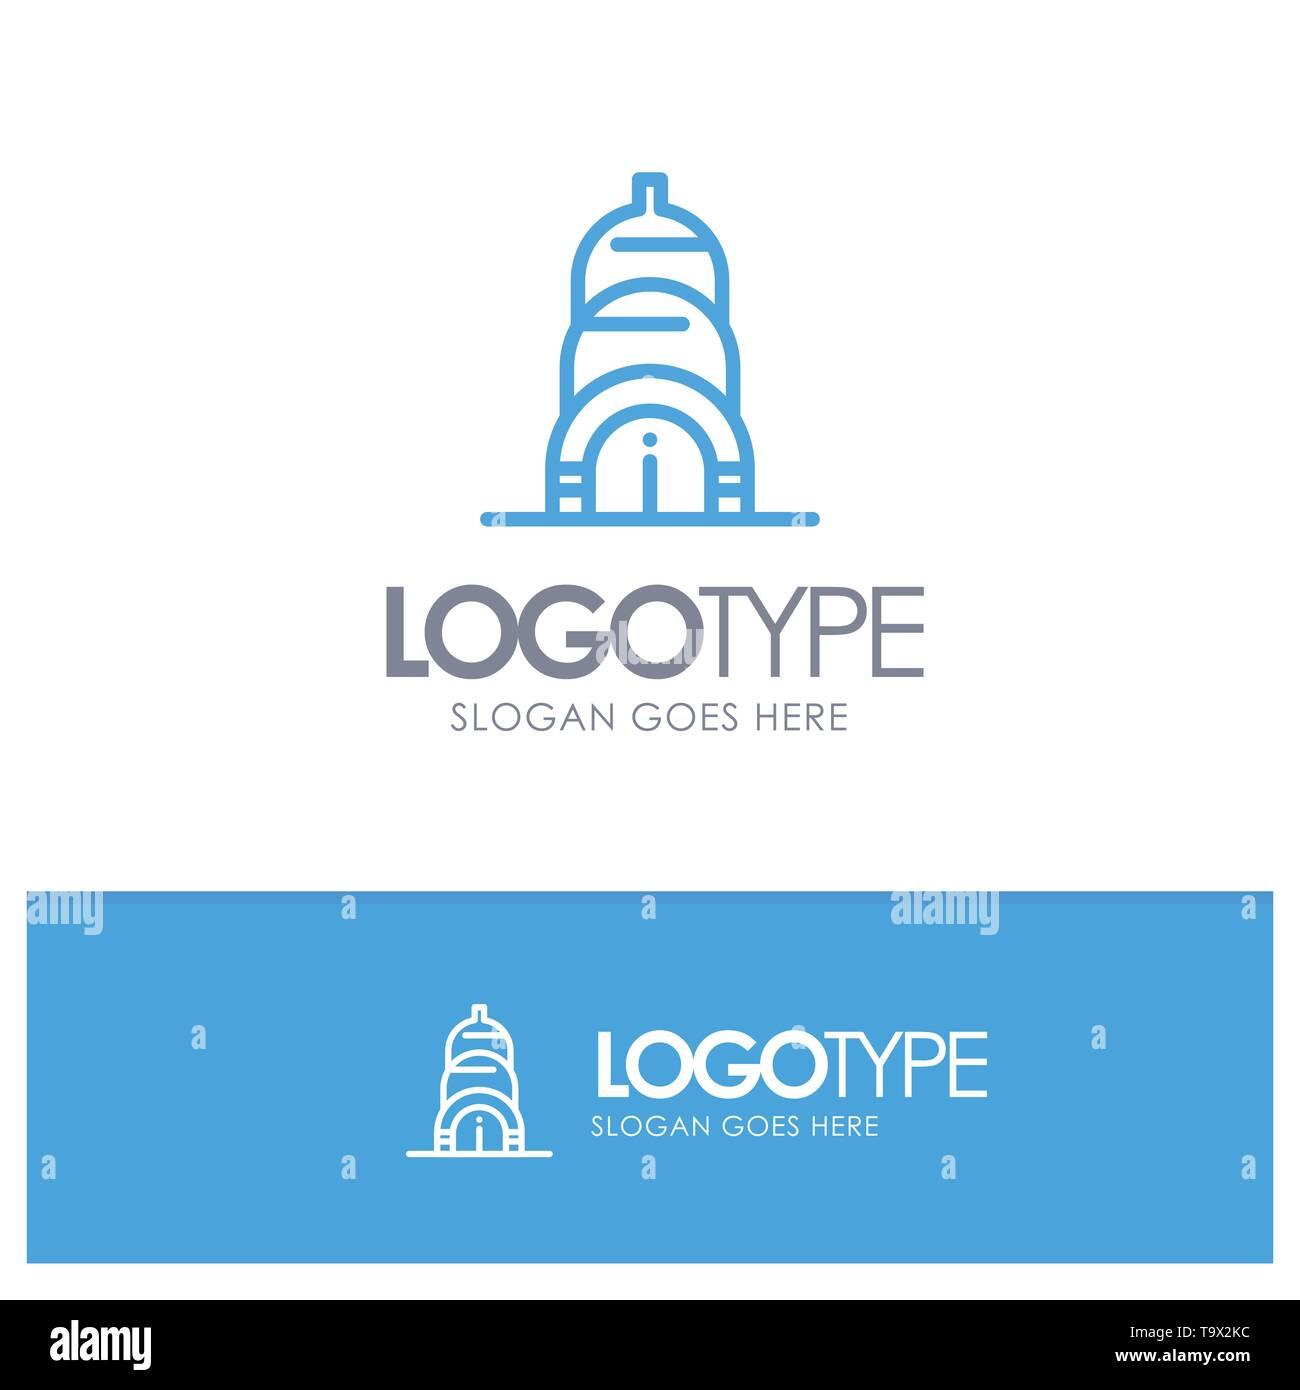 Chrysler, Building, Usa Blue Outline Logo Place for Tagline - Stock Vector